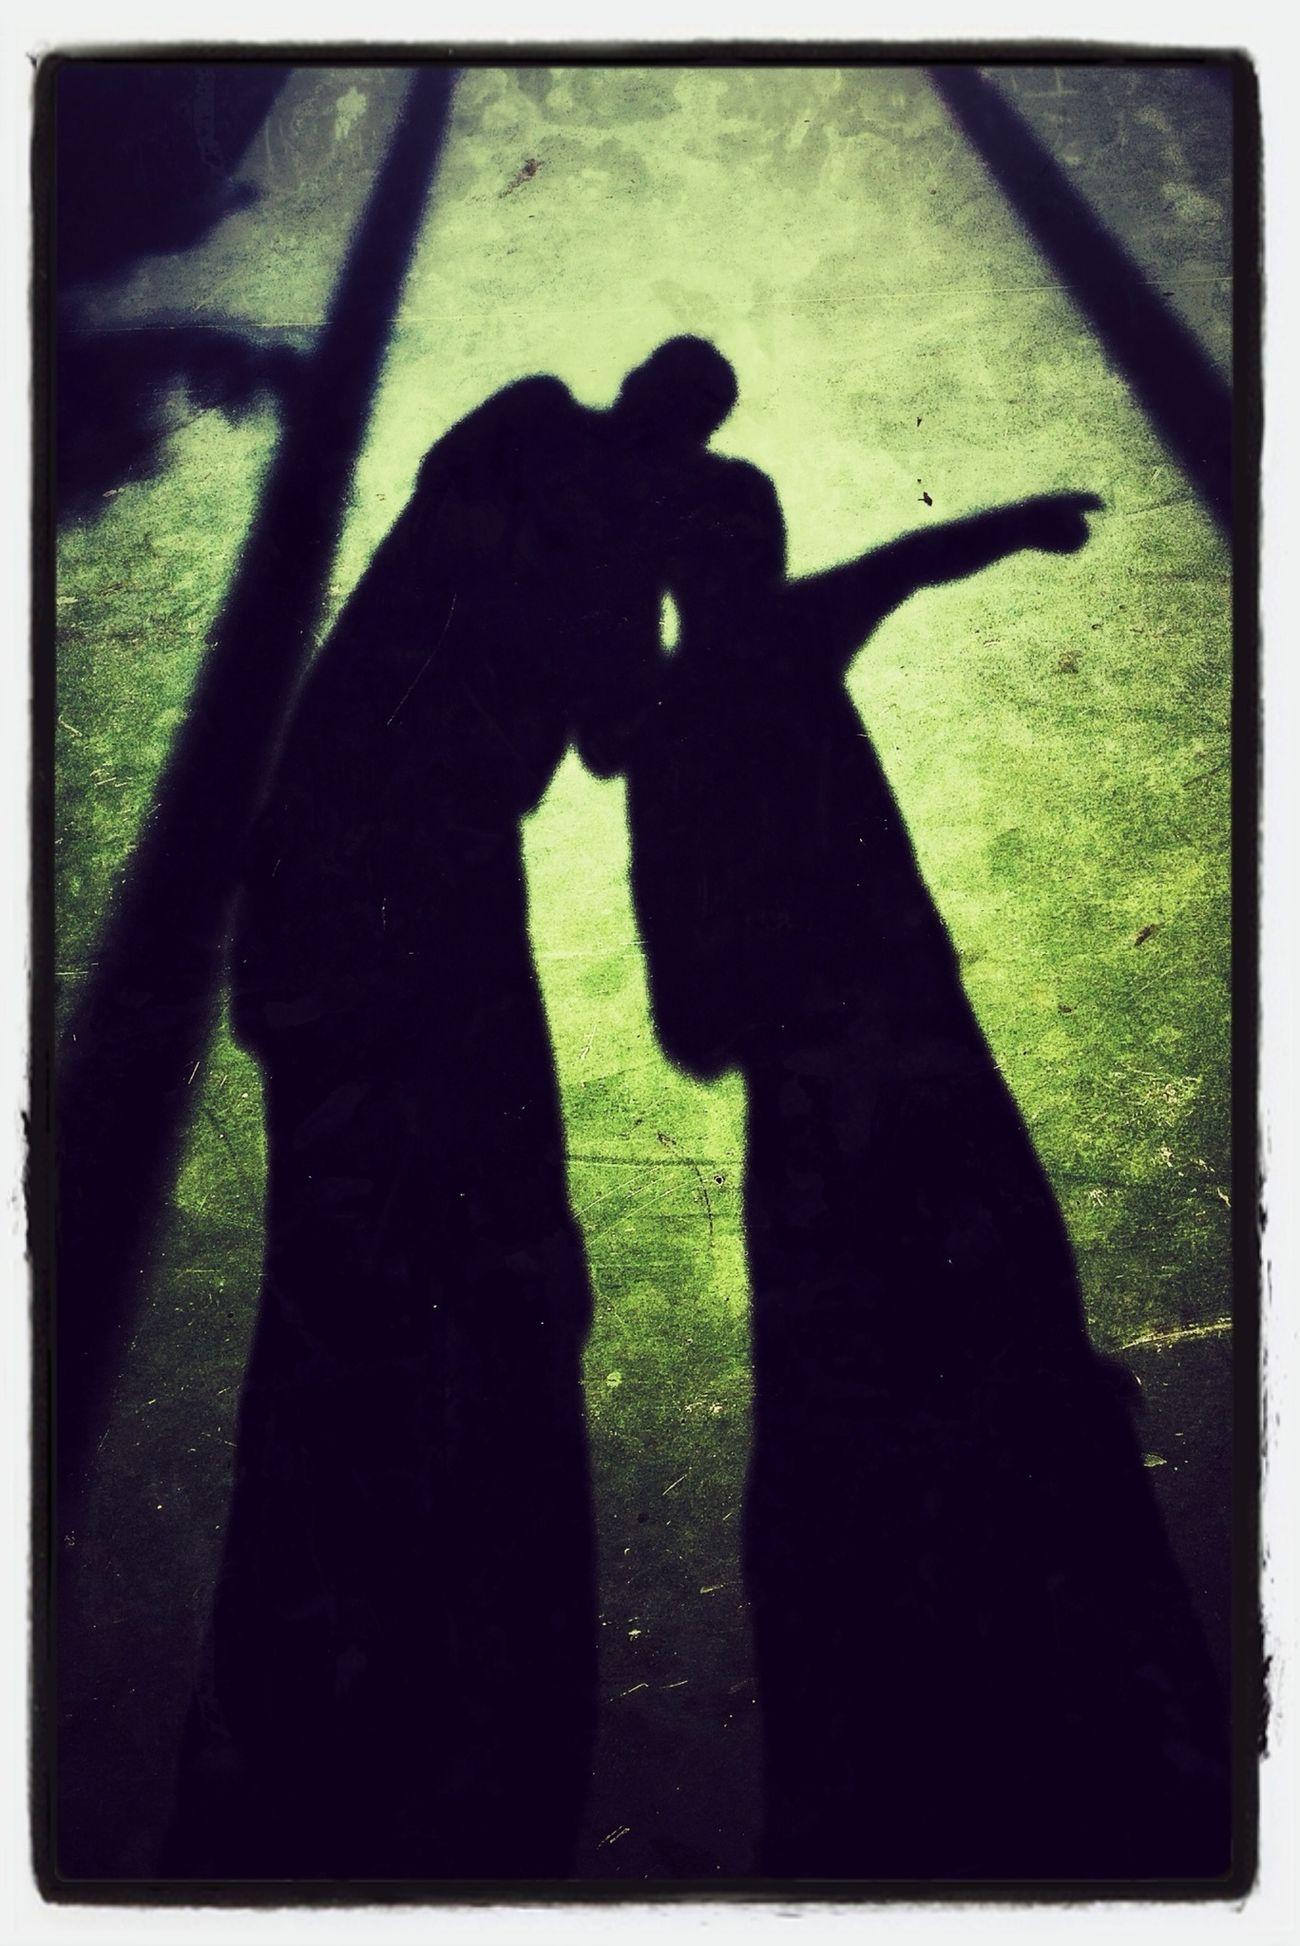 Schattenspiel  of Father & Son